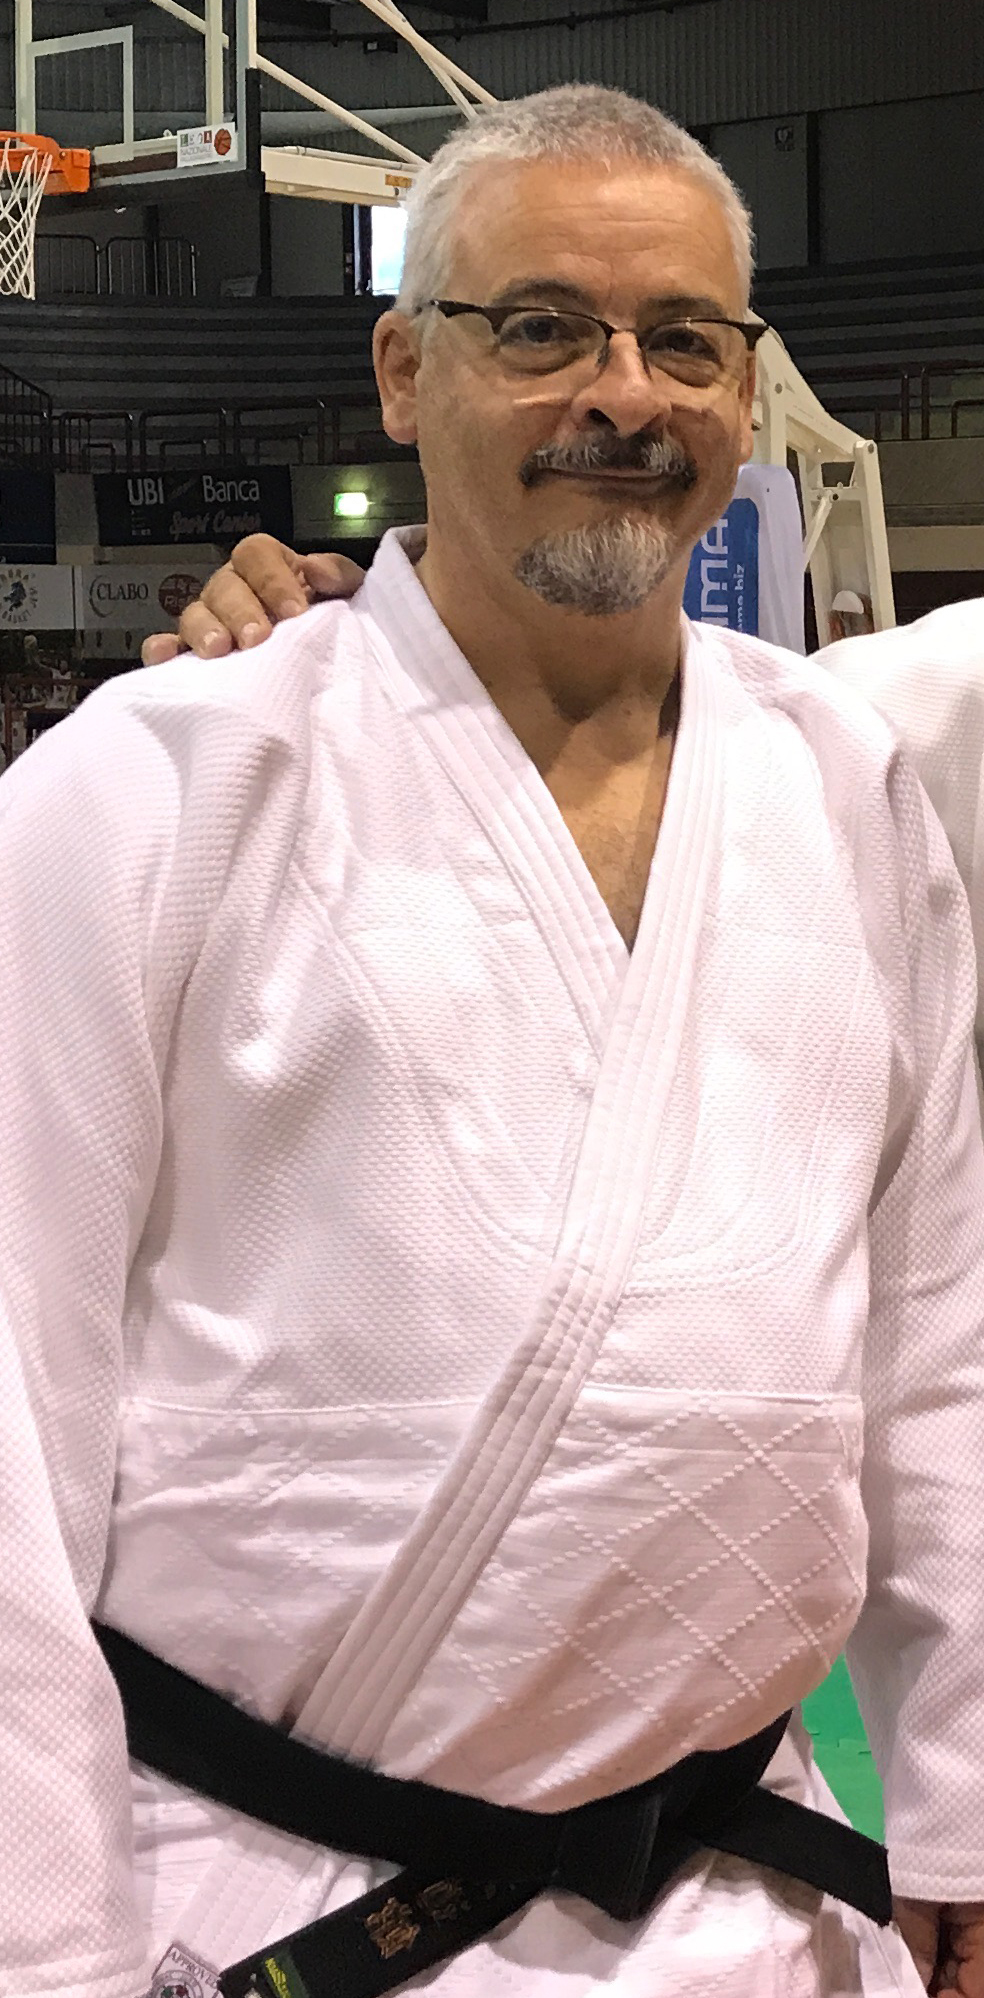 Alessandro visintini judo